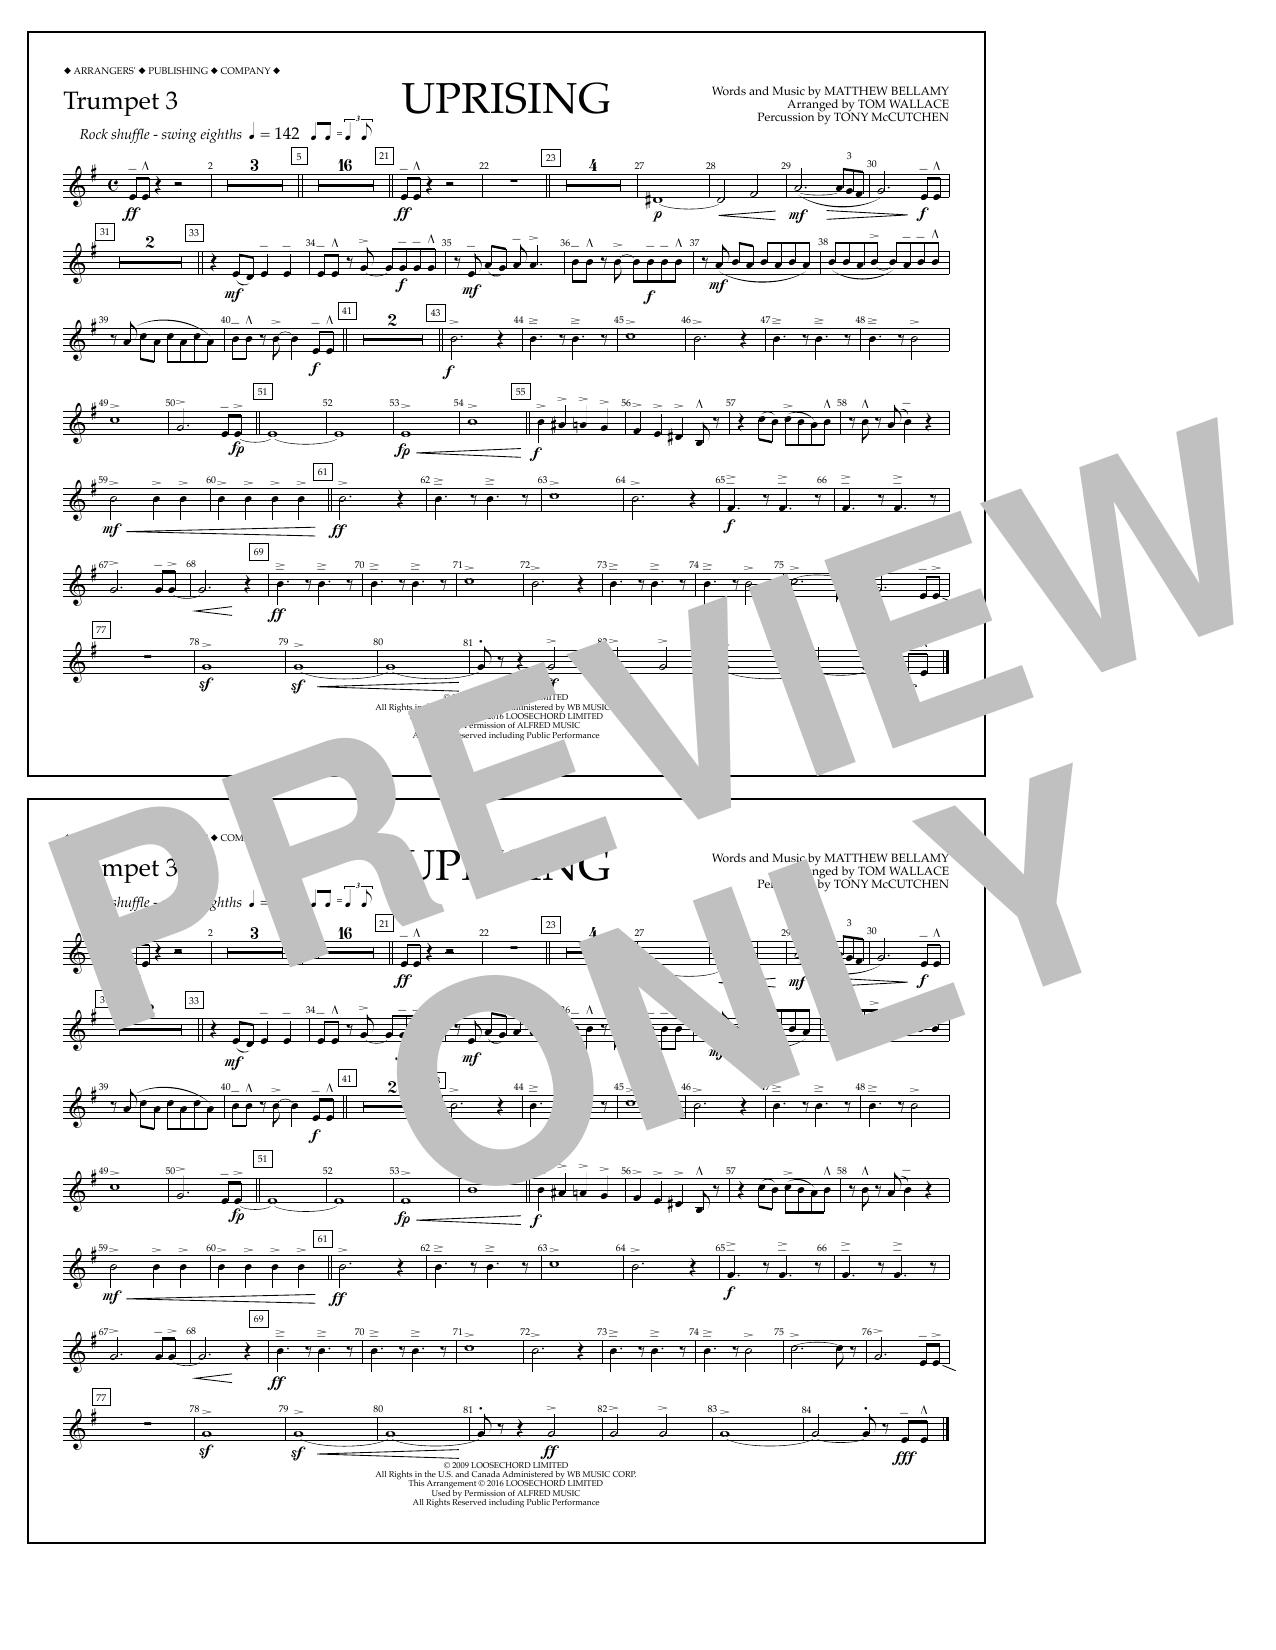 Muse - Uprising - Trumpet 3